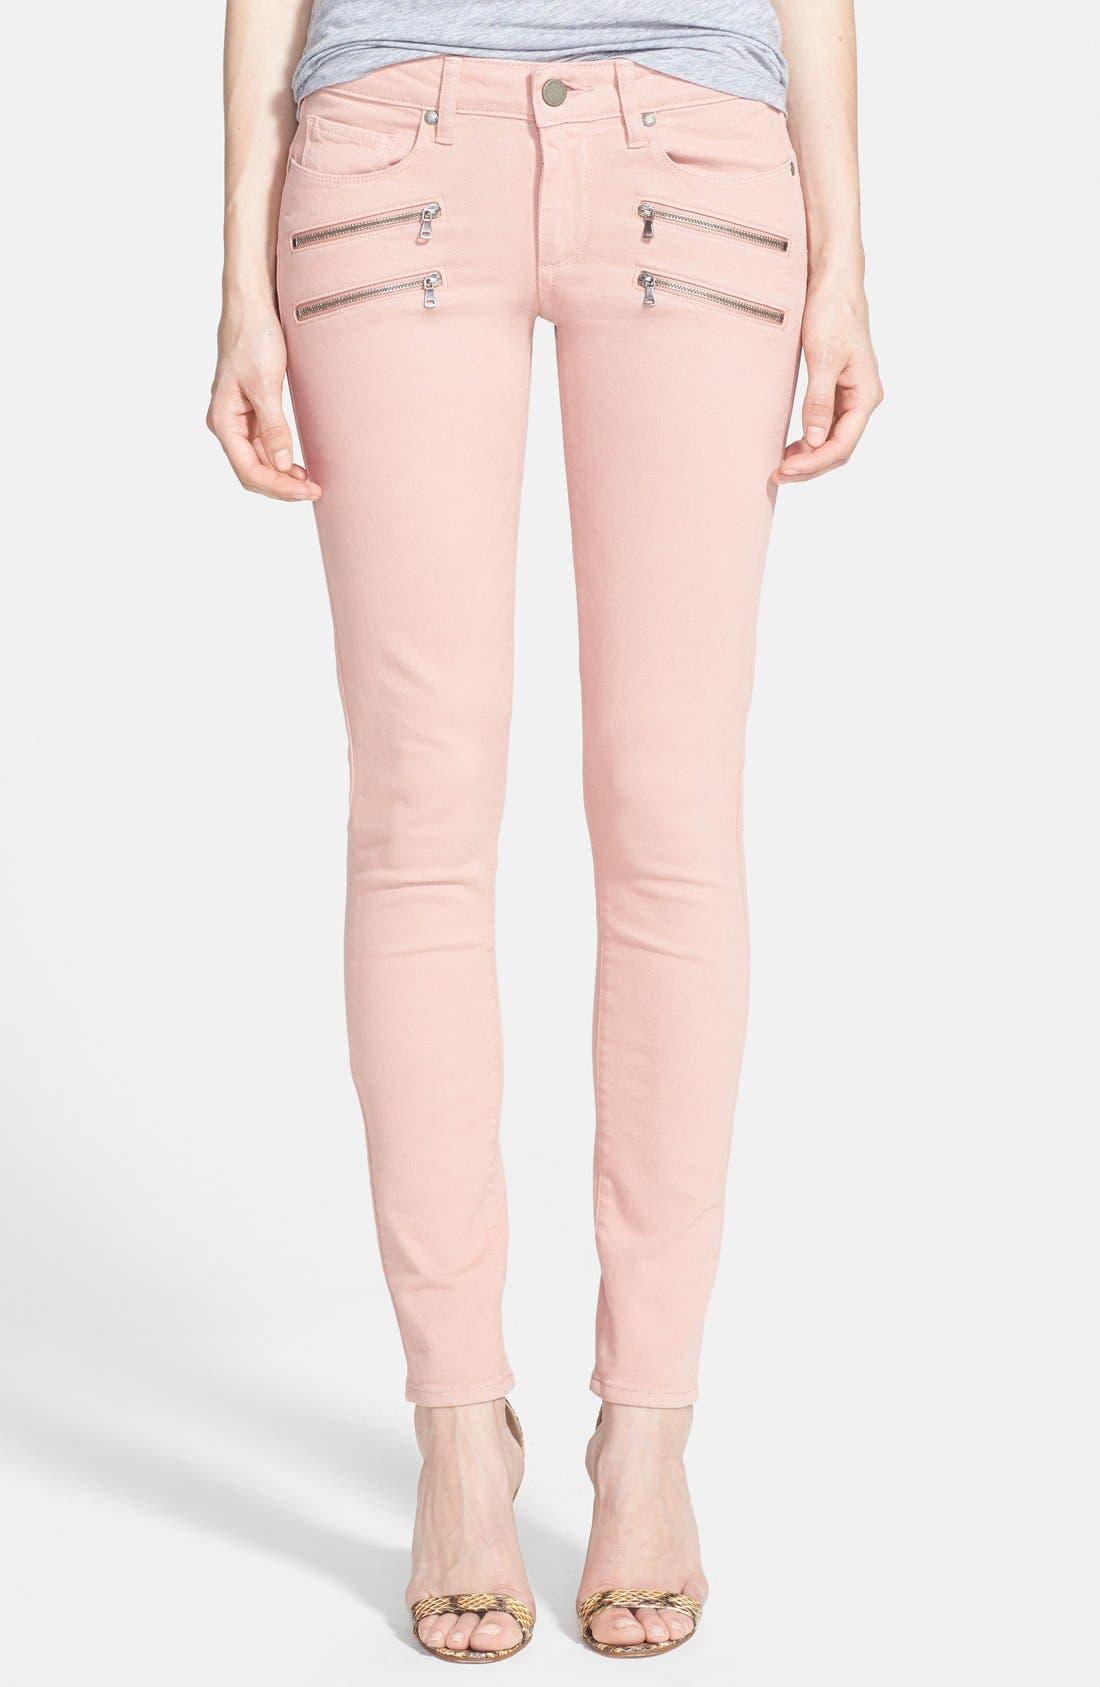 Main Image - Paige Denim 'Edgemont' Ultra Skinny Jeans (Ballet Pink)